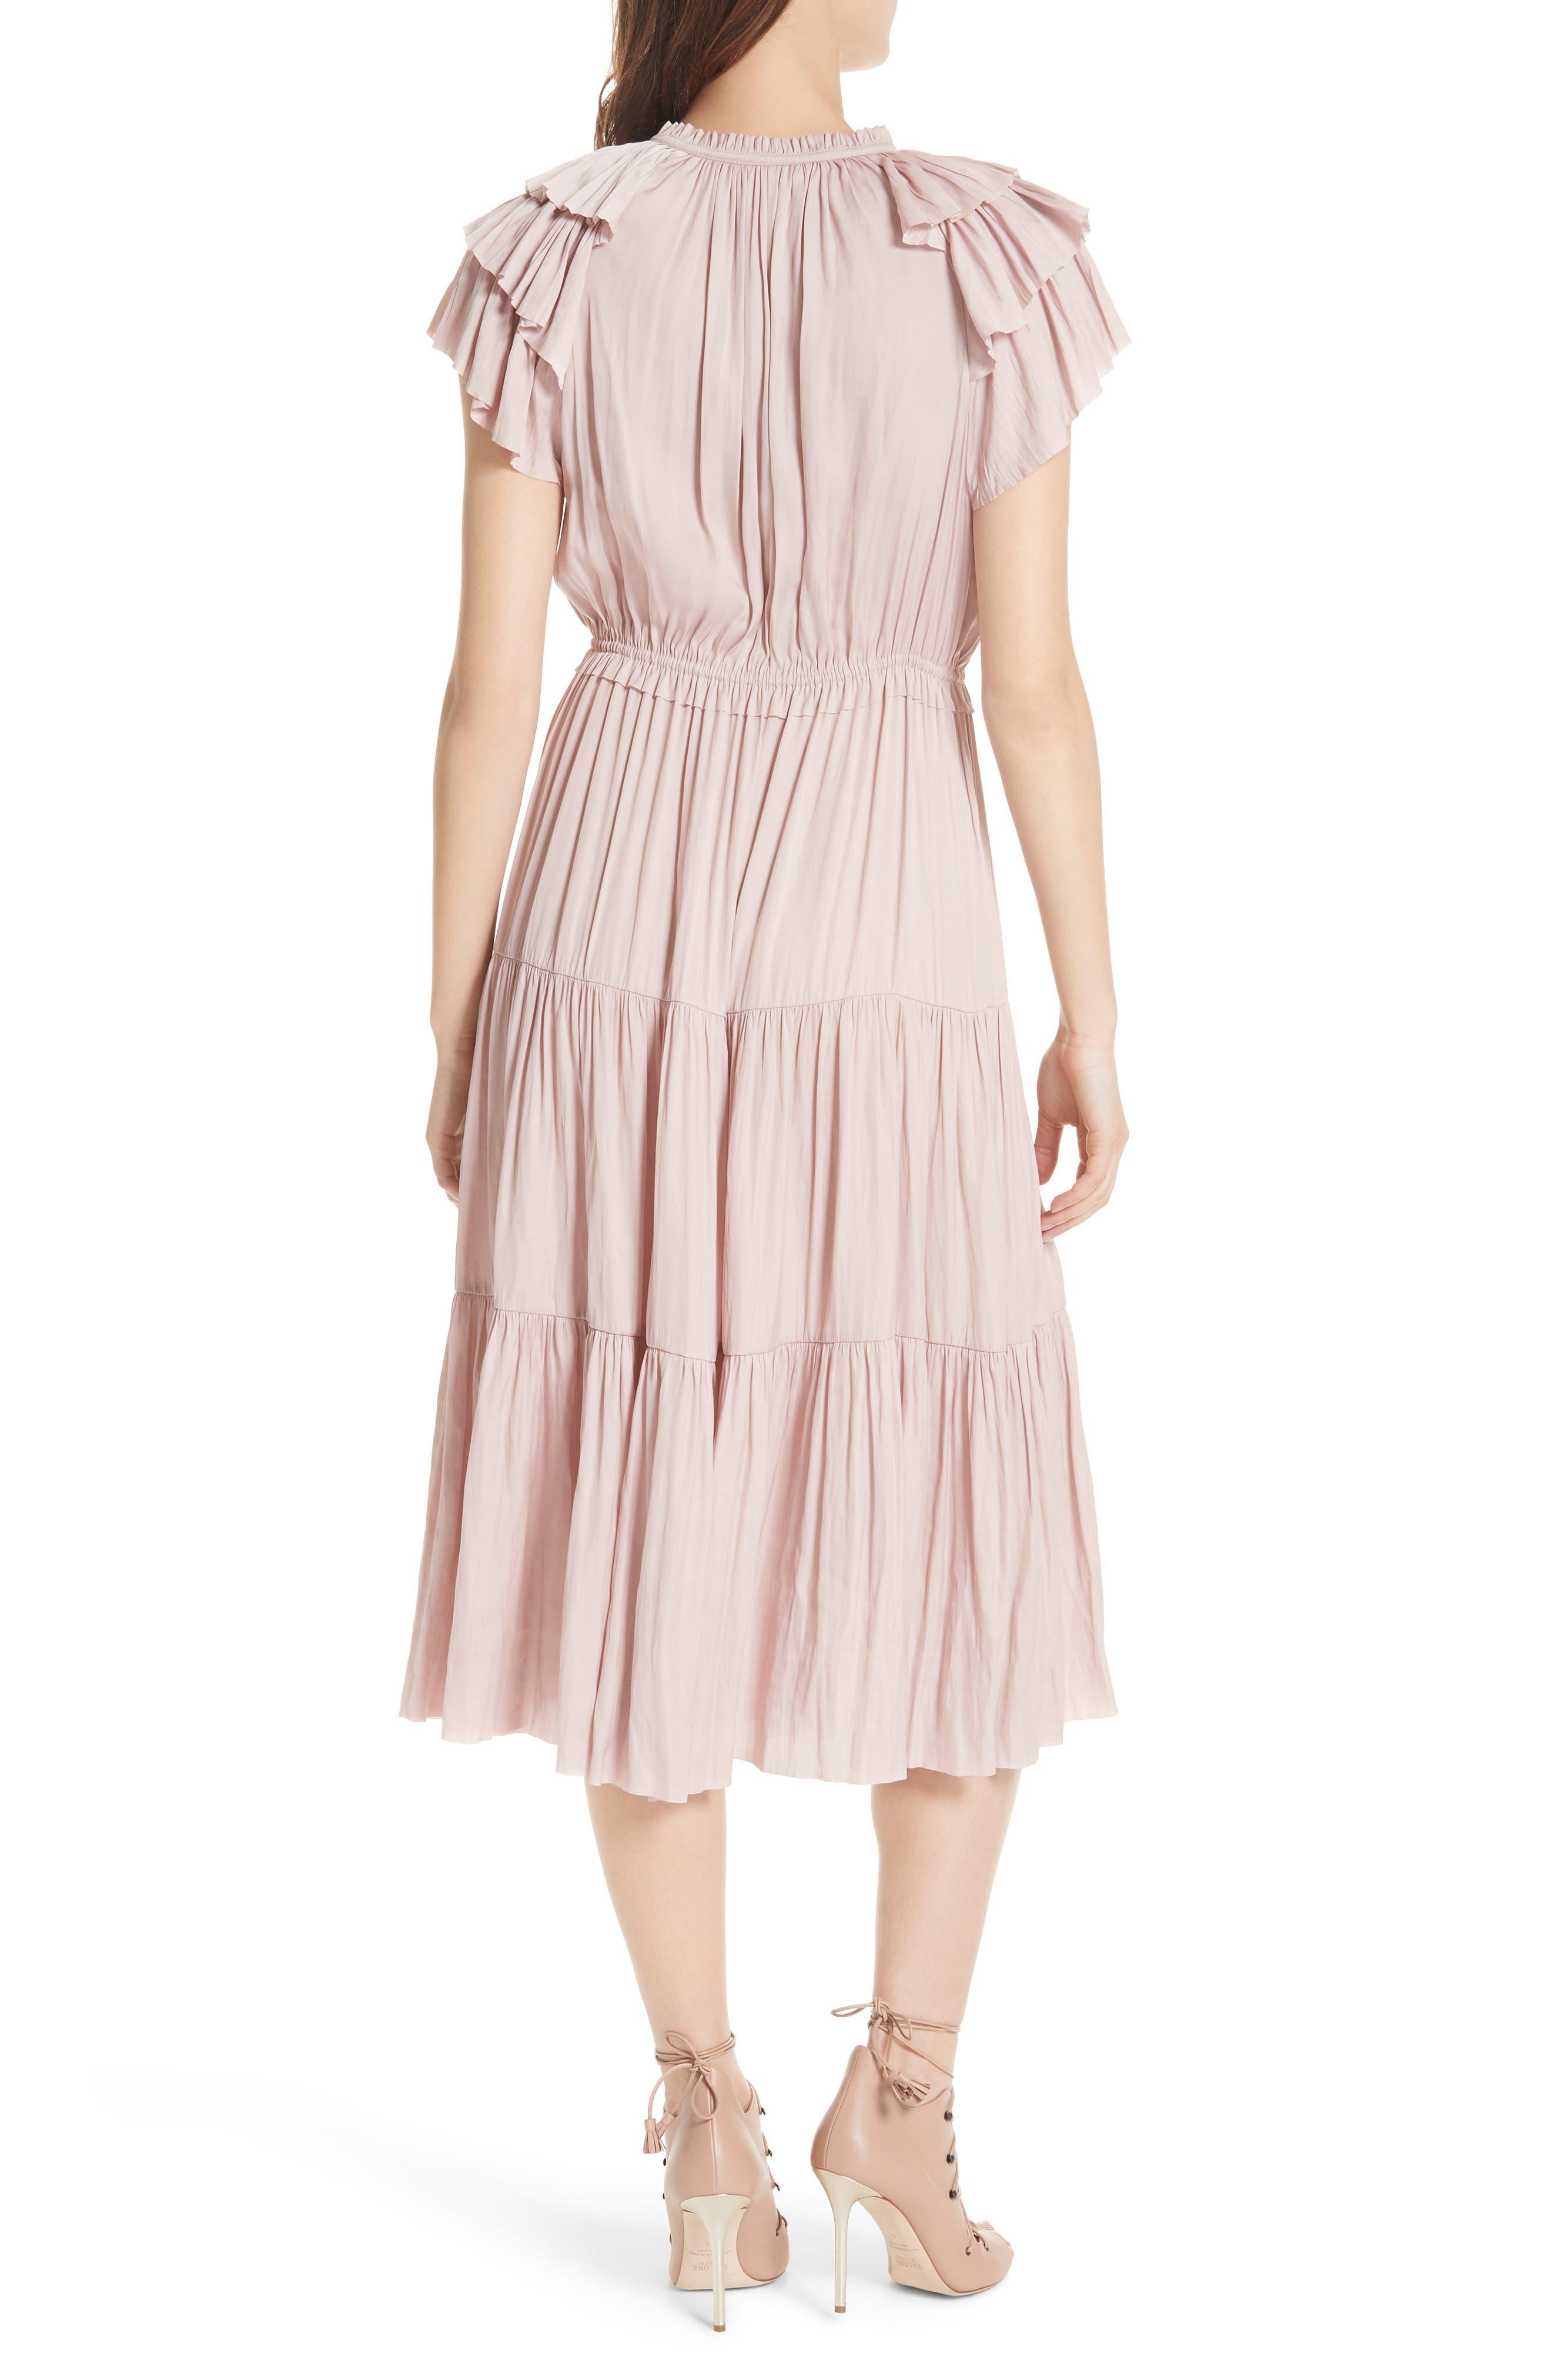 Blaire Satin Dress,                             Alternate thumbnail 2, color,                             Rose